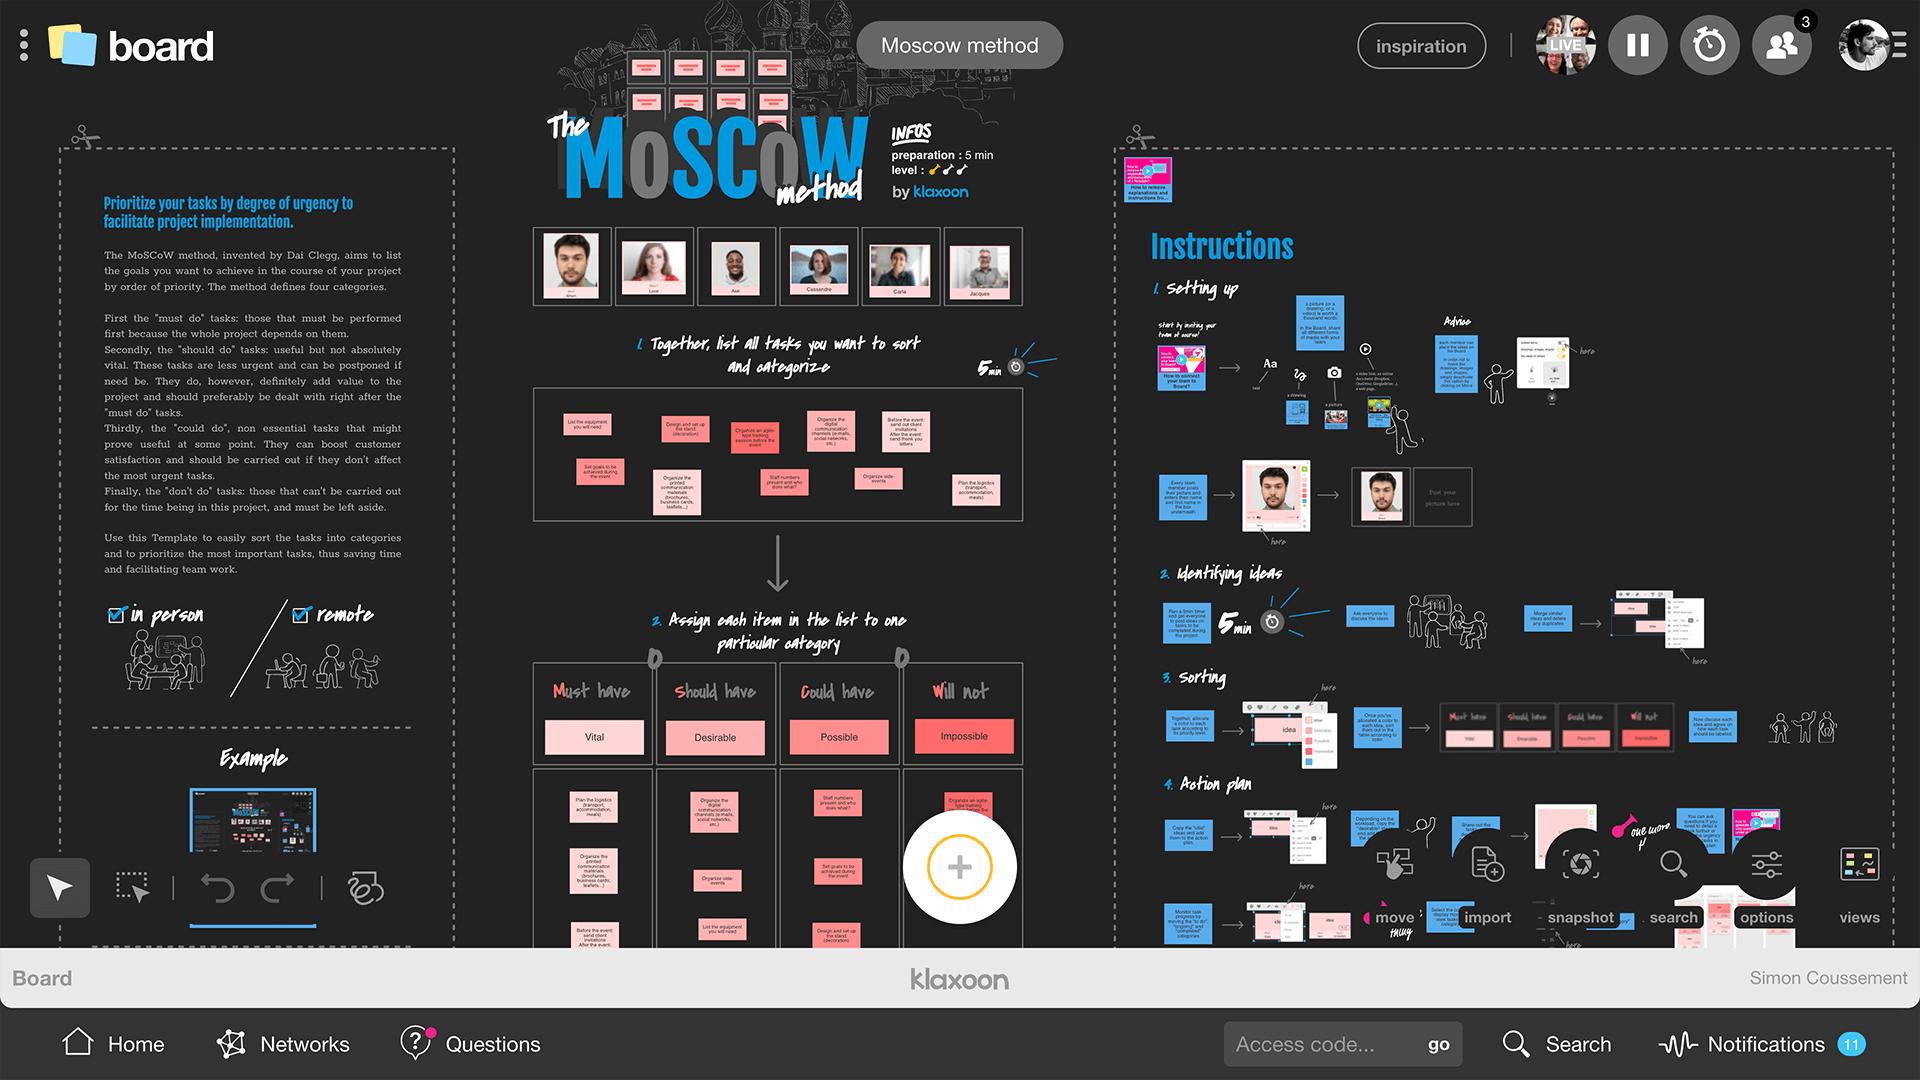 Example the Moscow method |Klaxoon